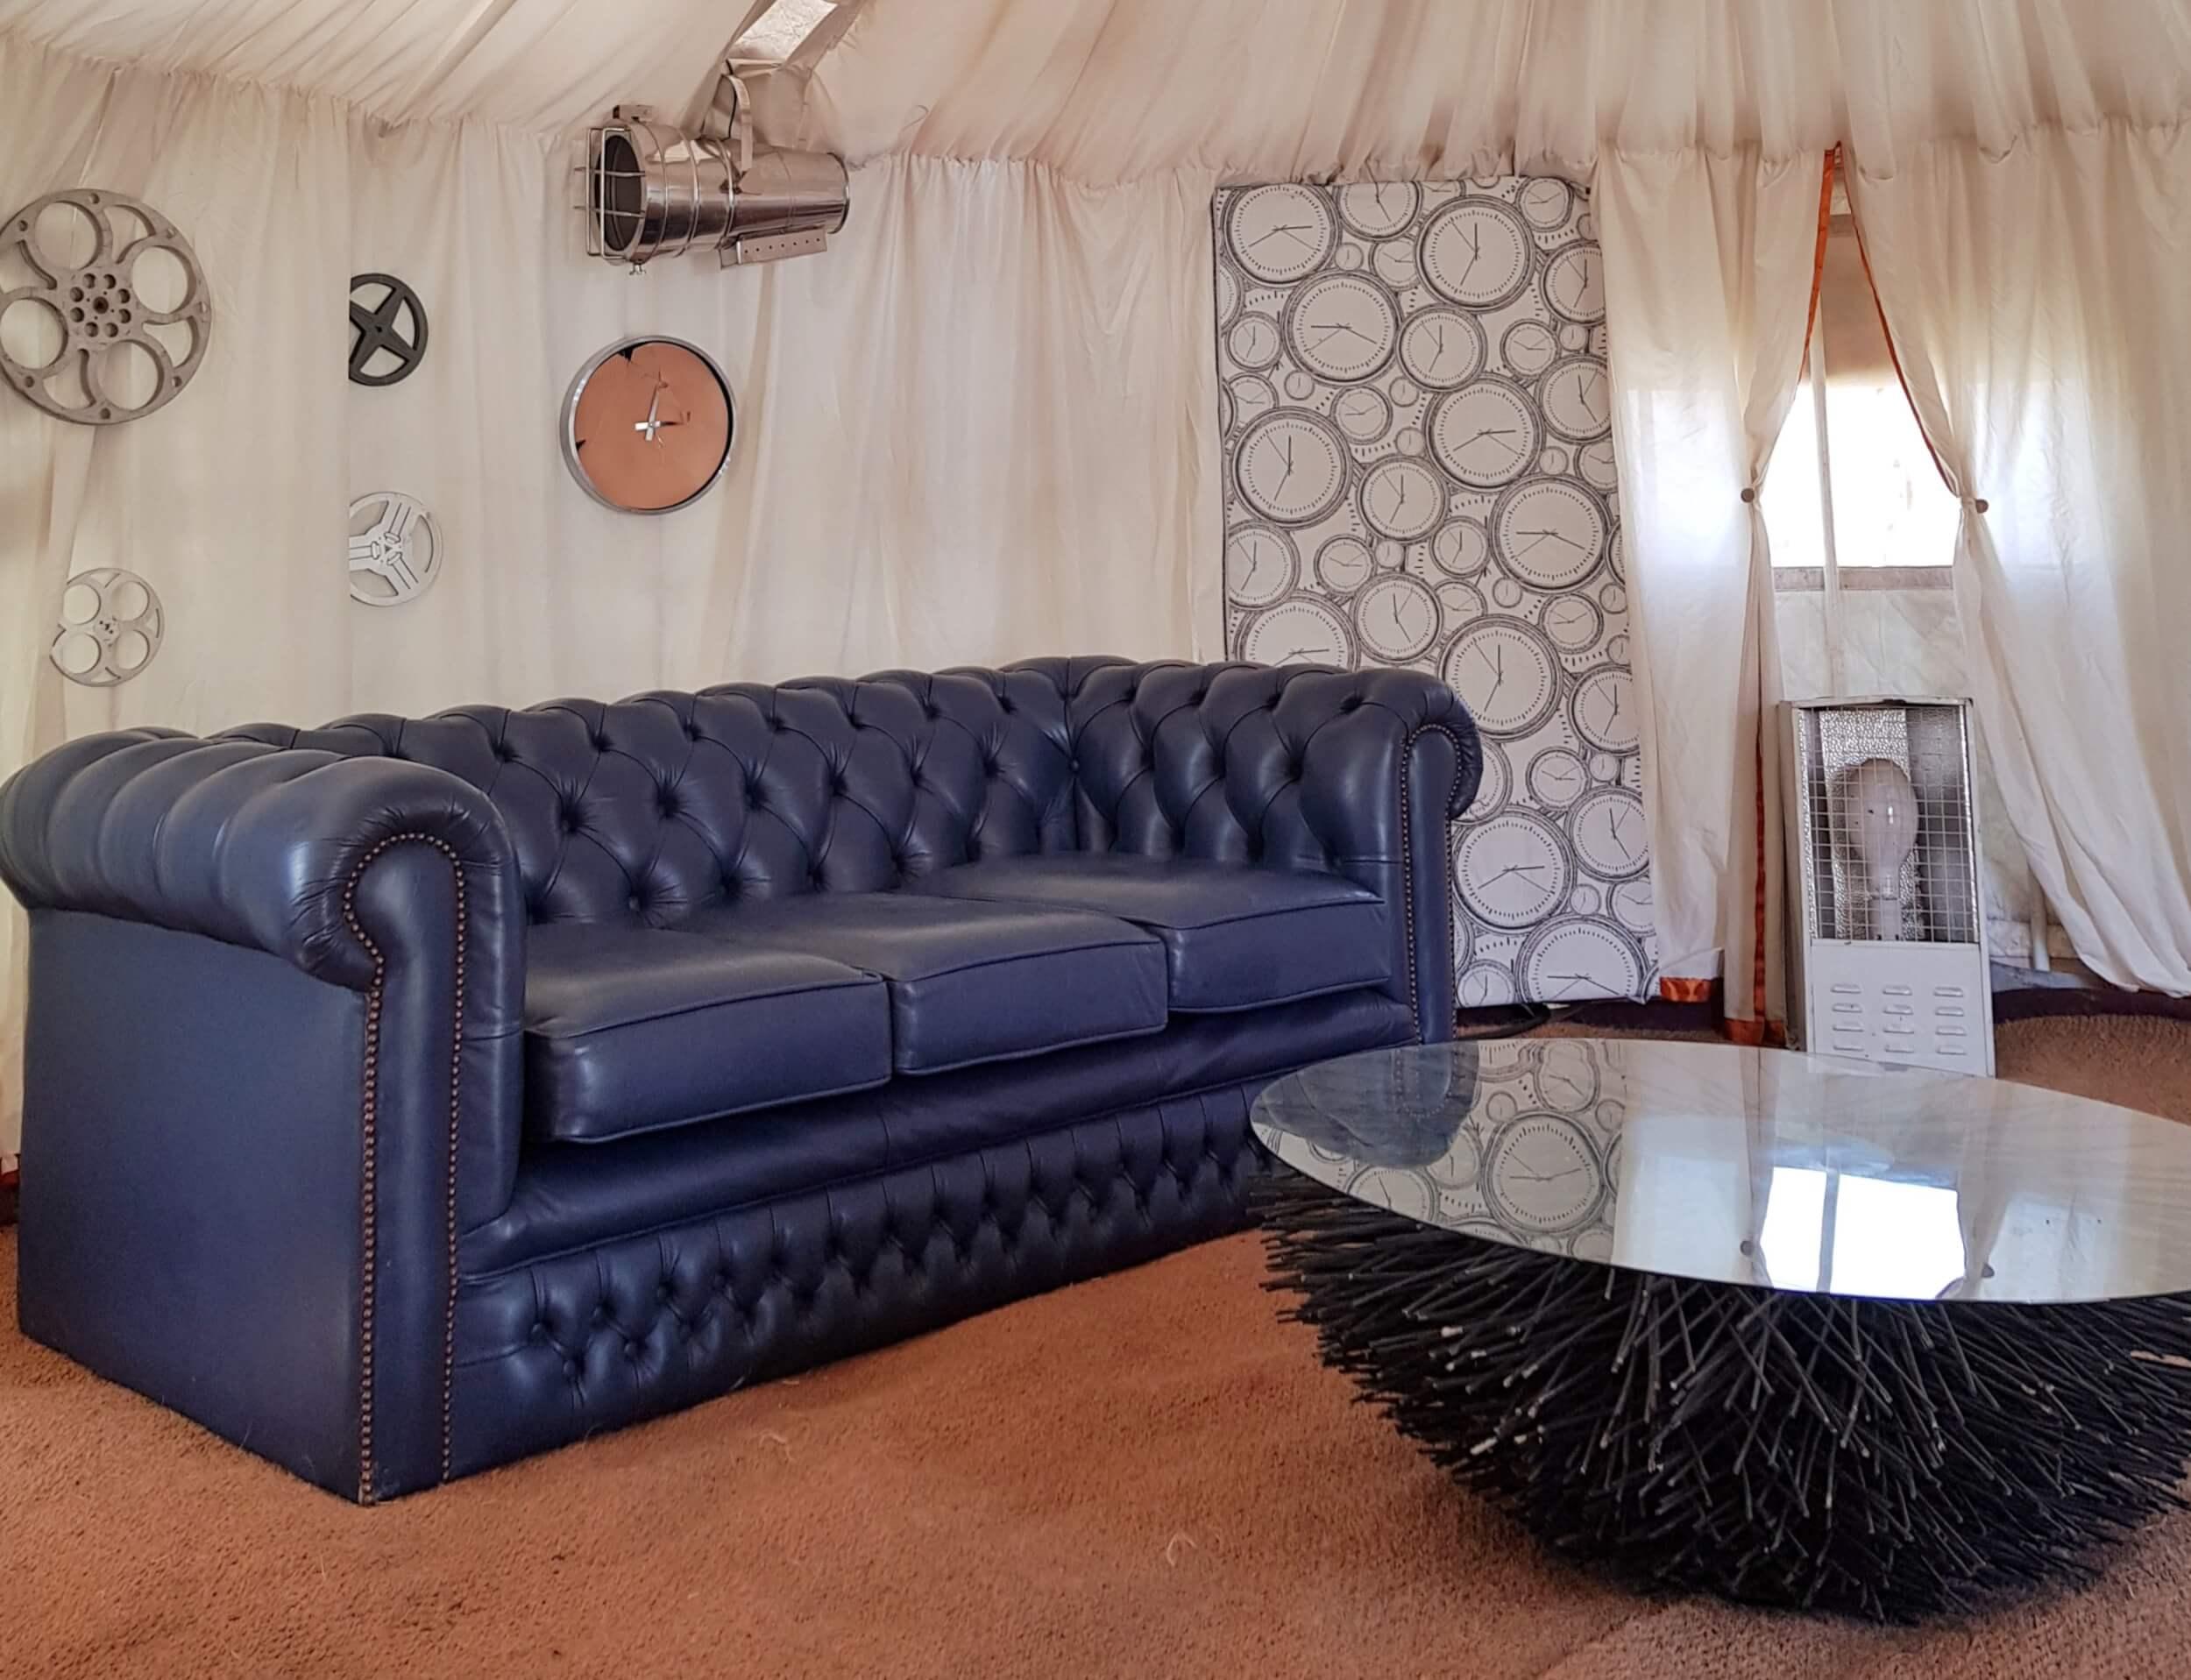 Event yurts at boomtown interior decor|plush tents